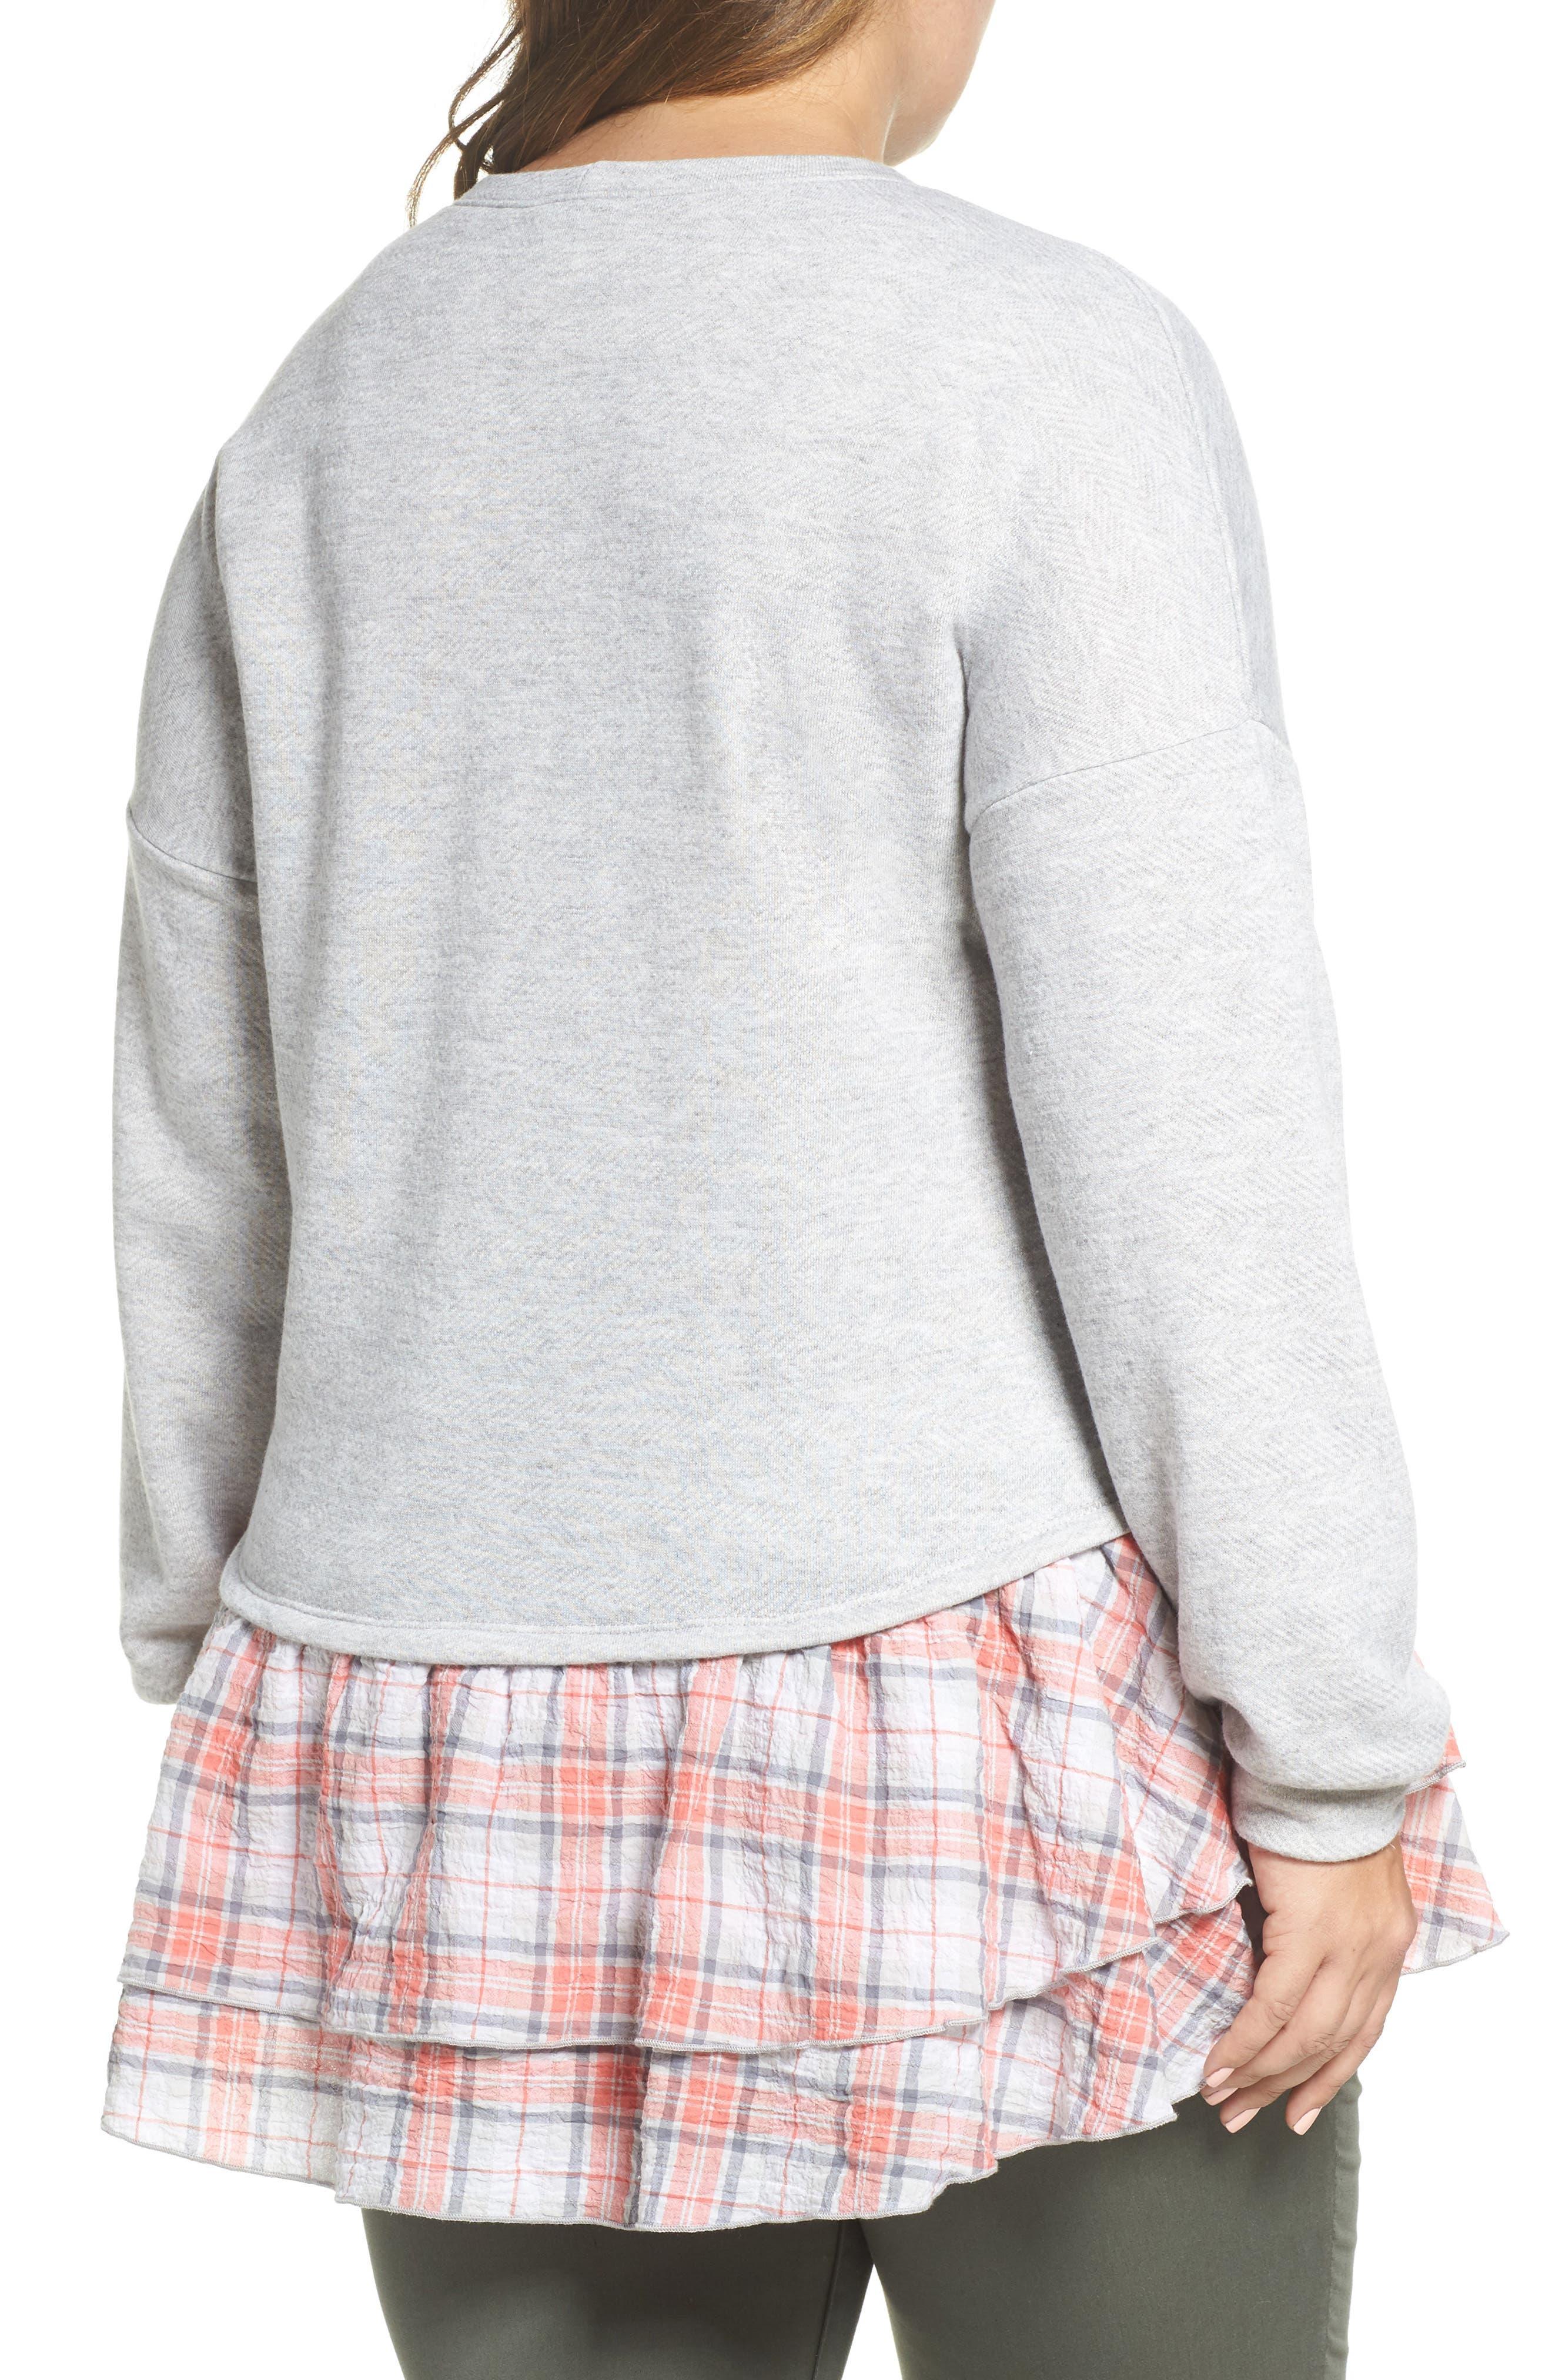 Layered Look Sweatshirt,                             Alternate thumbnail 2, color,                             030